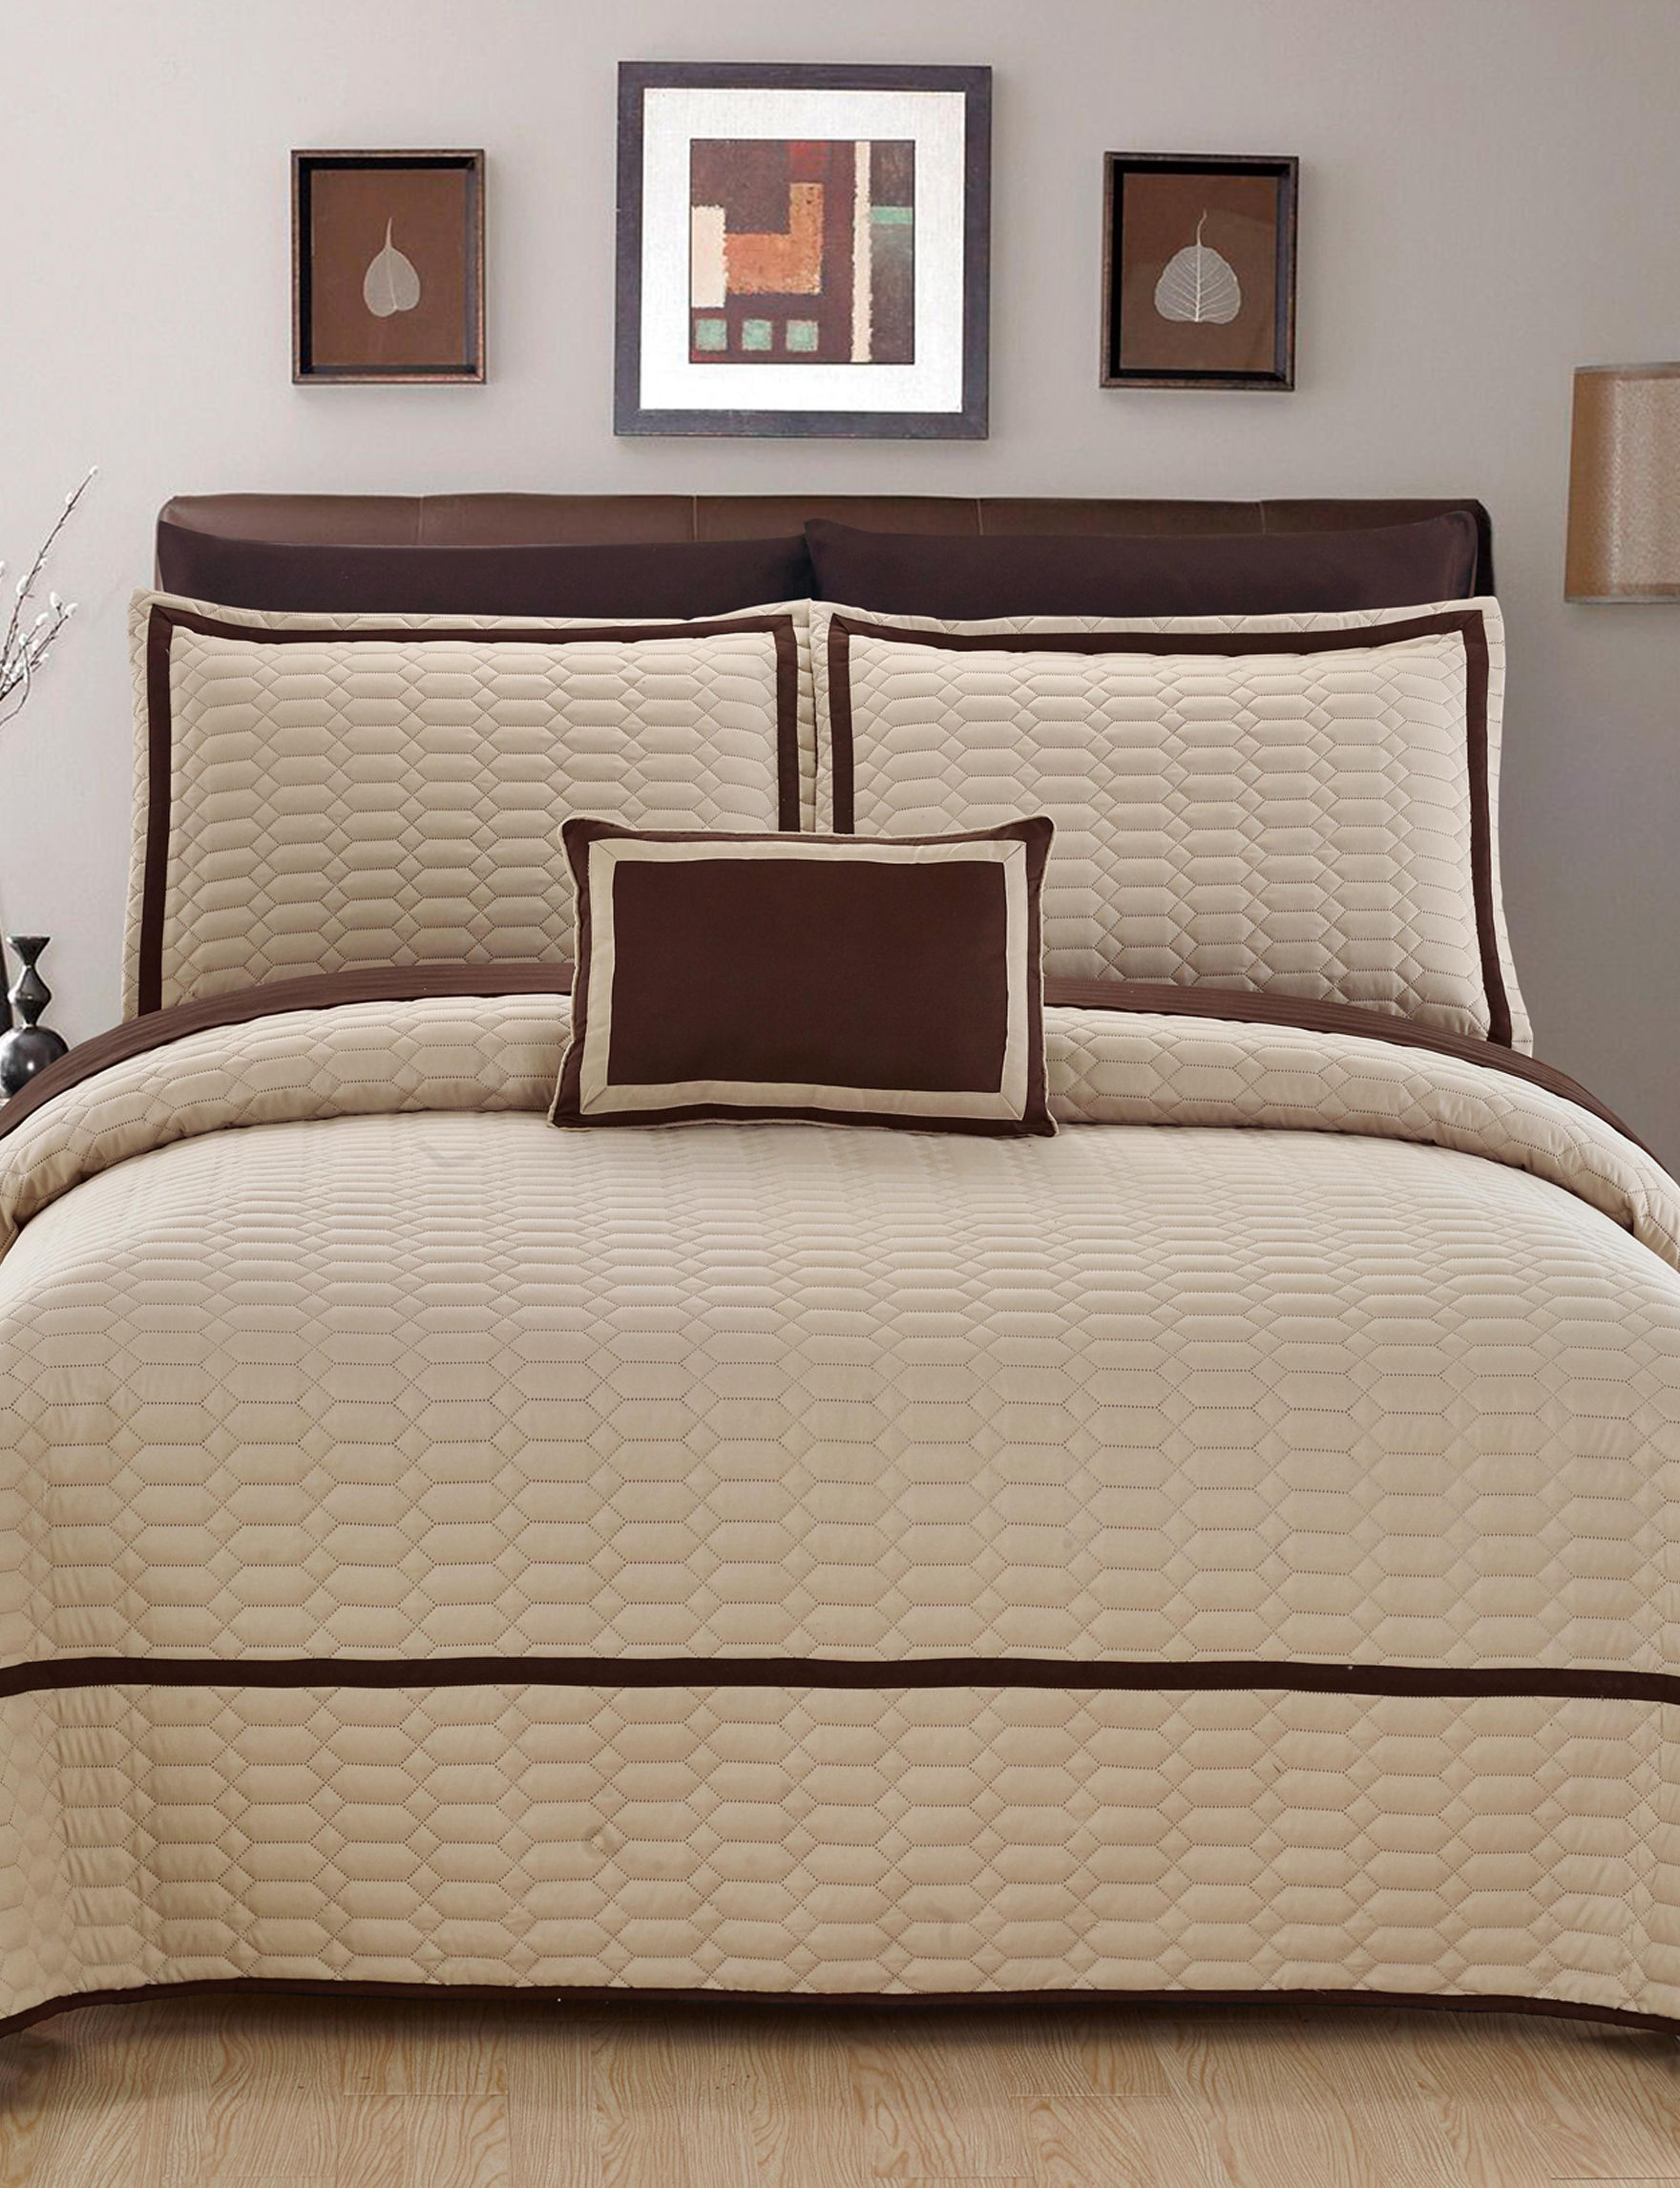 Chic Home Design Beige Quilts & Quilt Sets